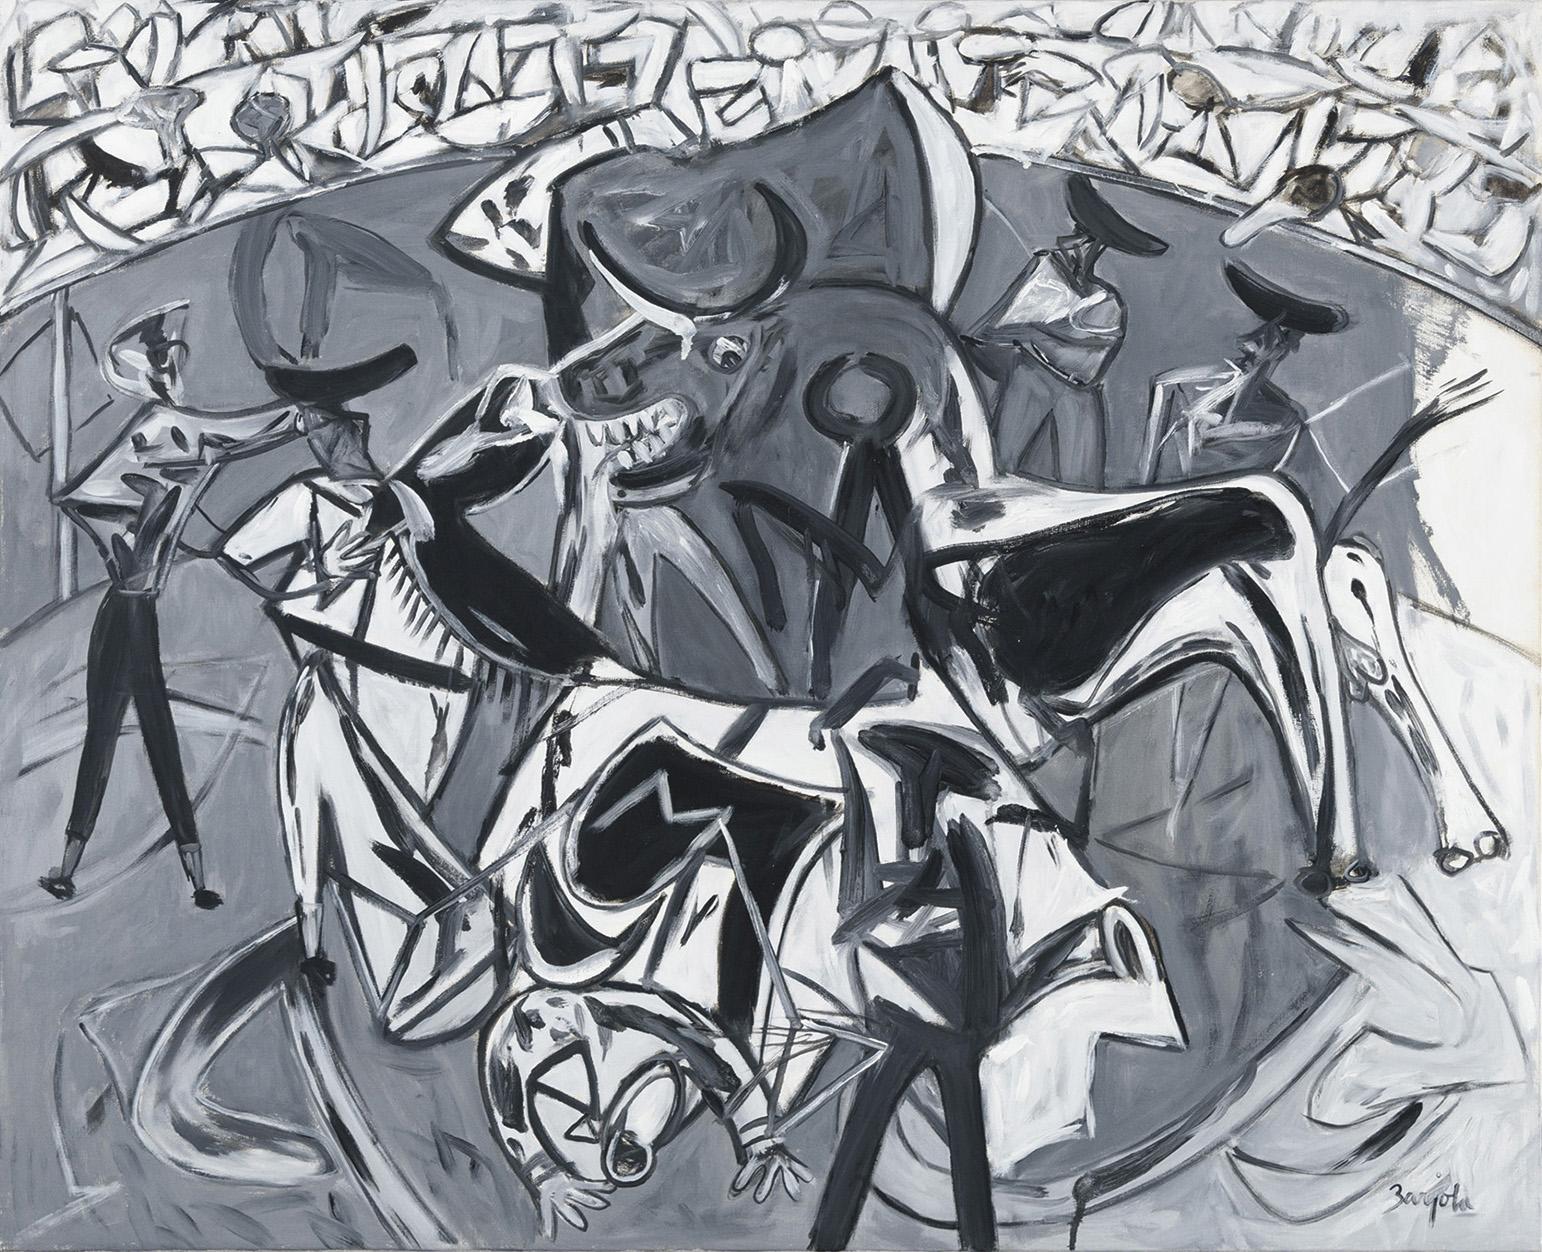 Juan Barjola. Tauromaquia, 1999. Salida y remate: 35.000 euros